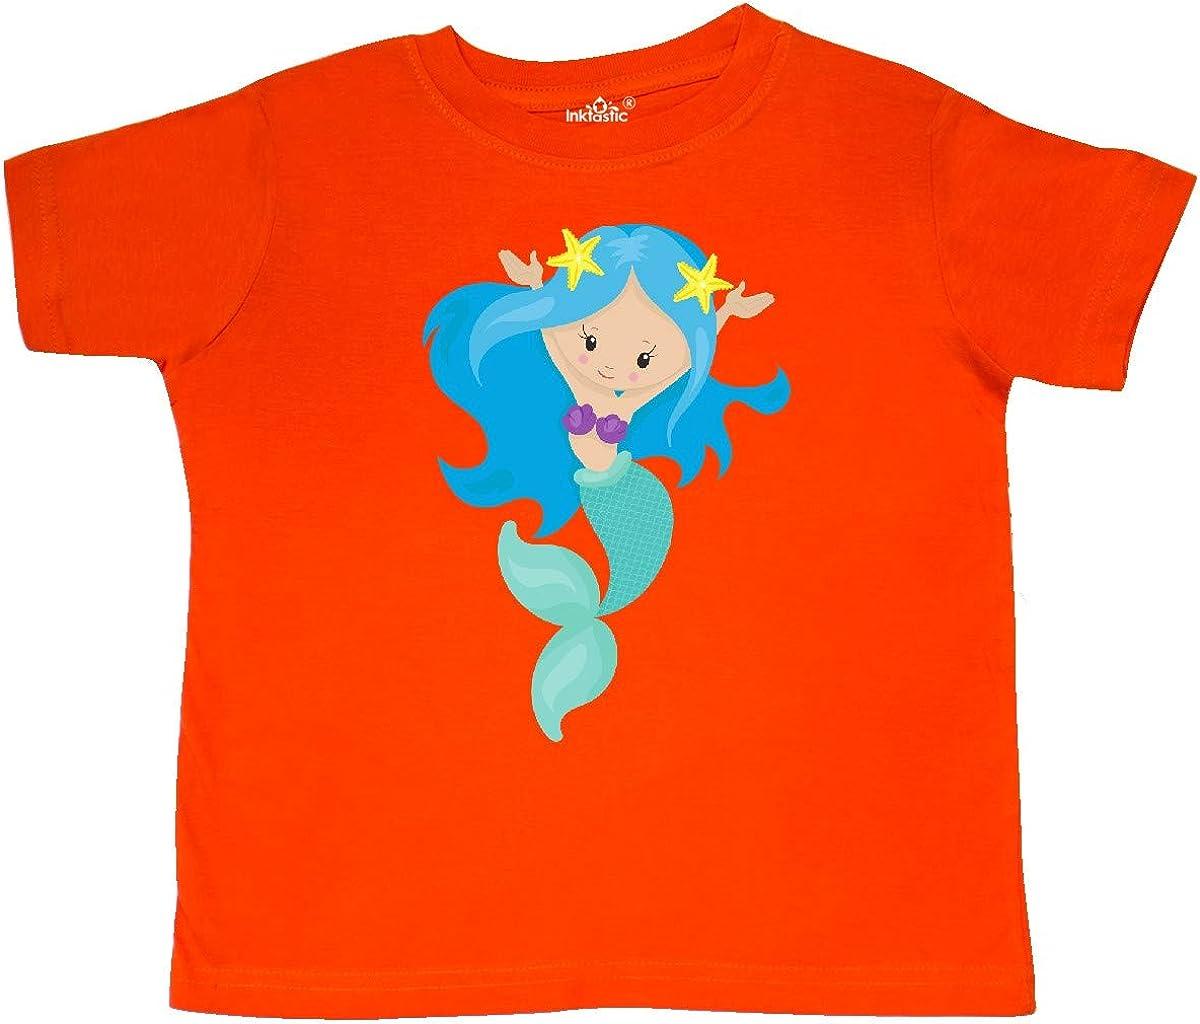 Green Tail Toddler T-Shirt inktastic Cute Mermaid with Long Blue Hair